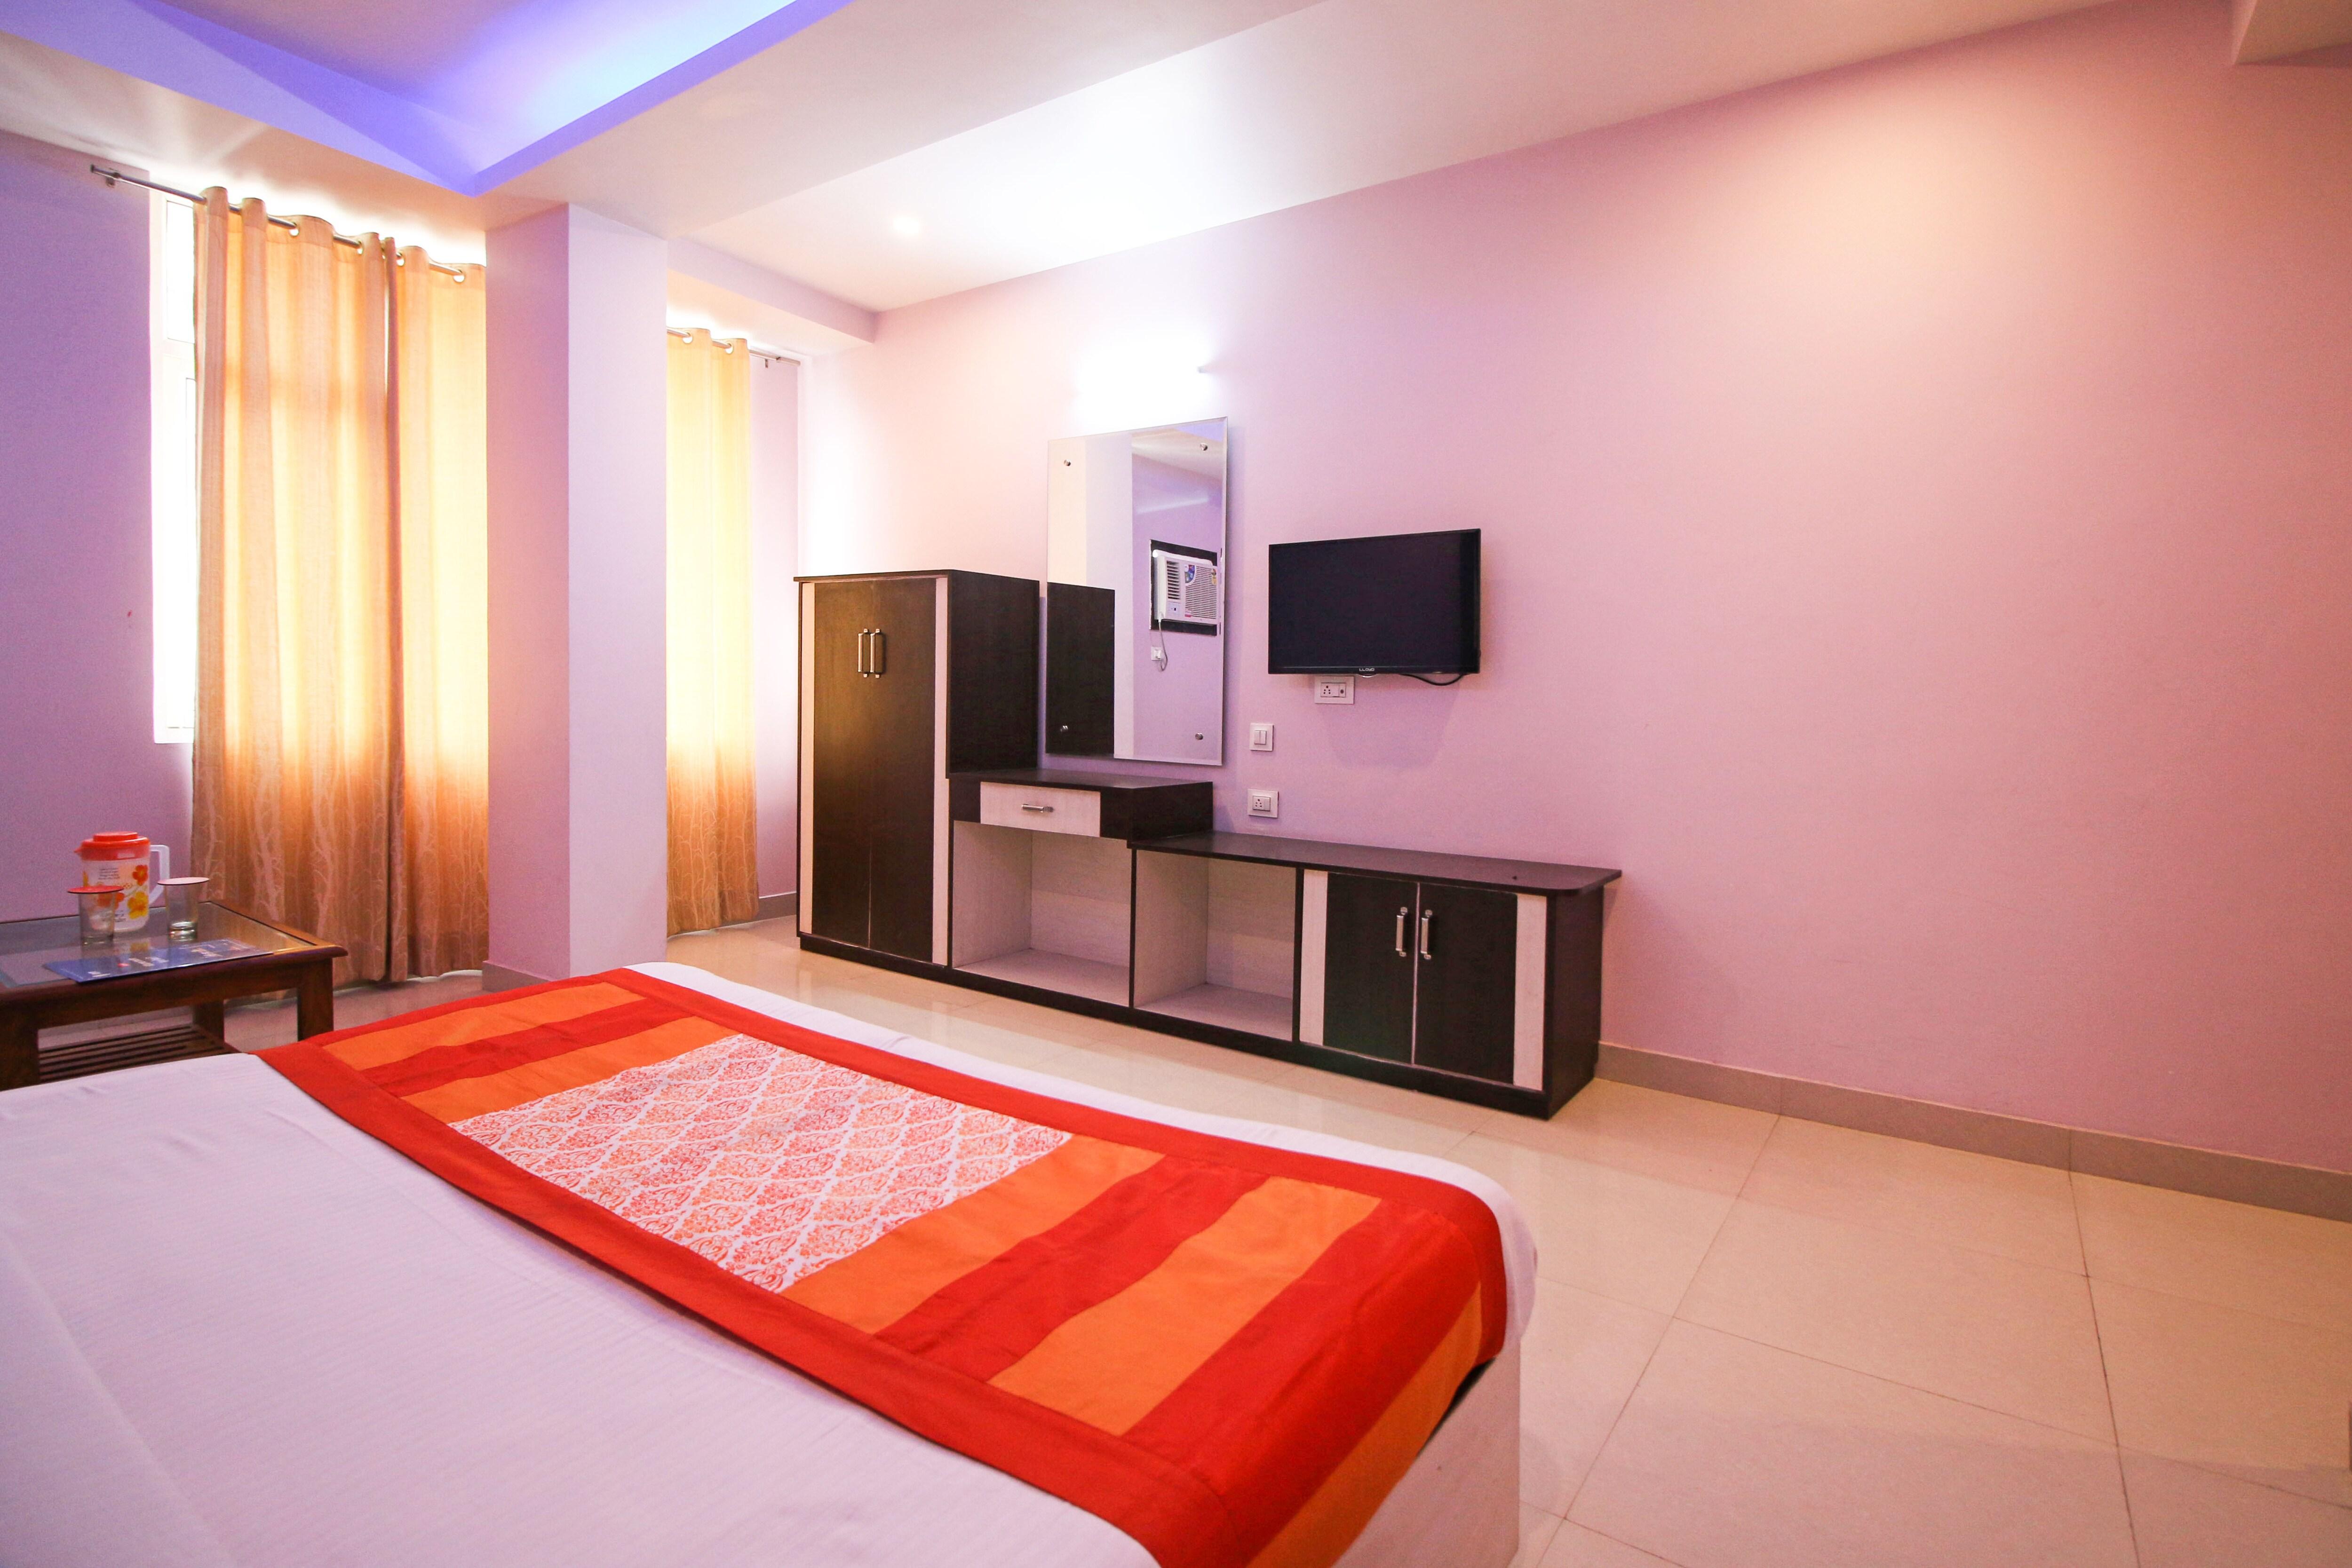 OYO 4690 Hotel Kanta International in katra